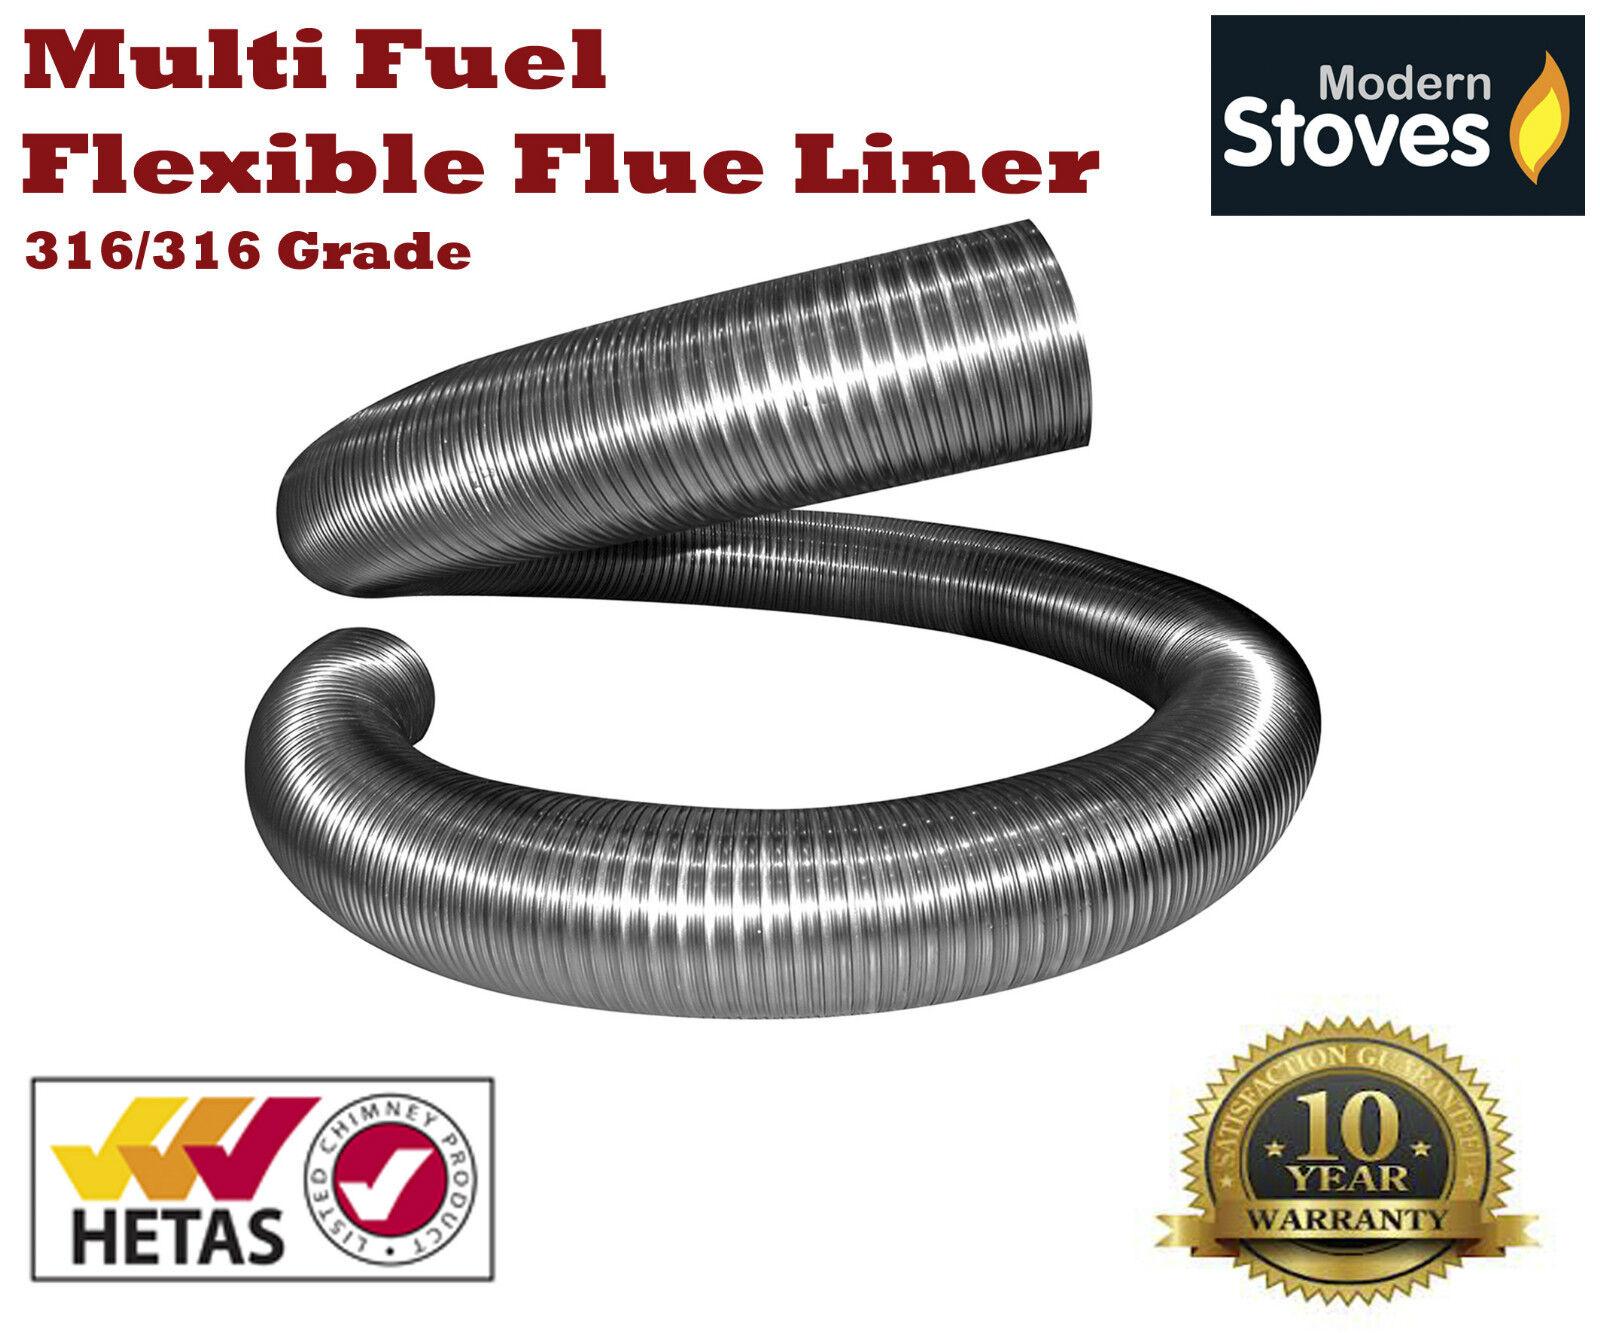 Multi-Fuel Stainless Steel Flexible Chimney Flue Liner for Wood ...